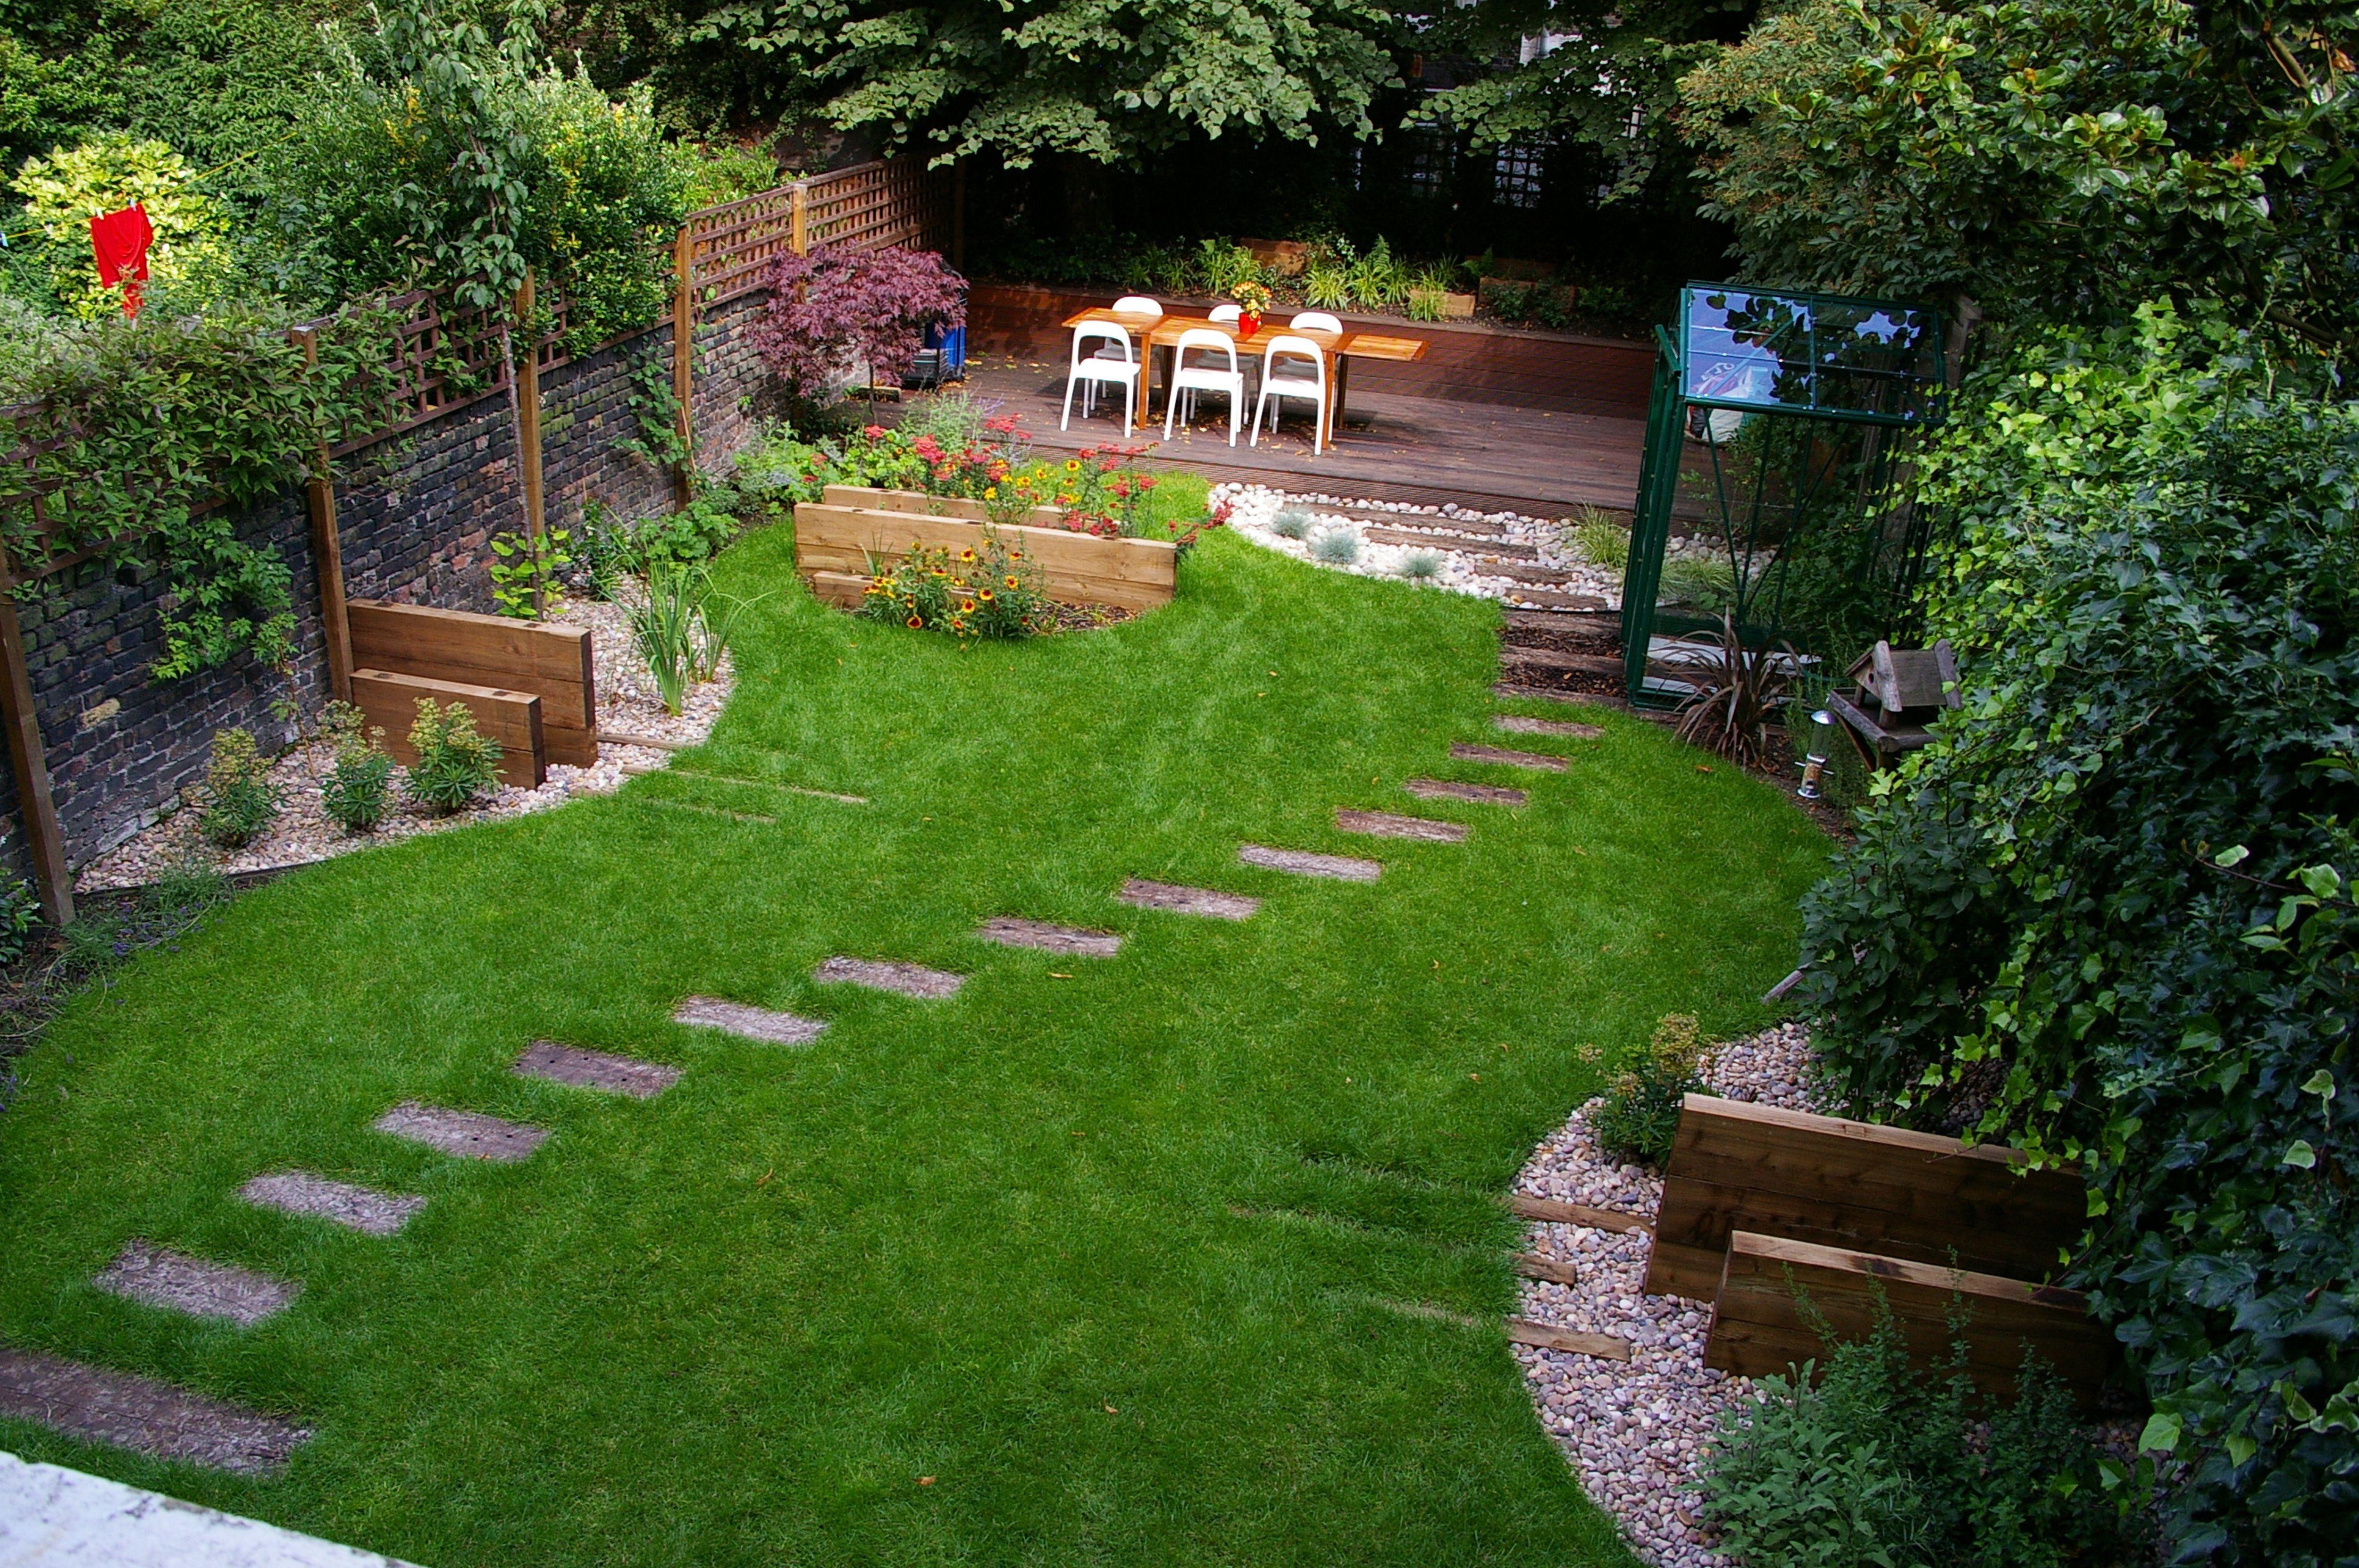 Pin Van Jennifer Eveland Op Backyard Inspiration Kleine